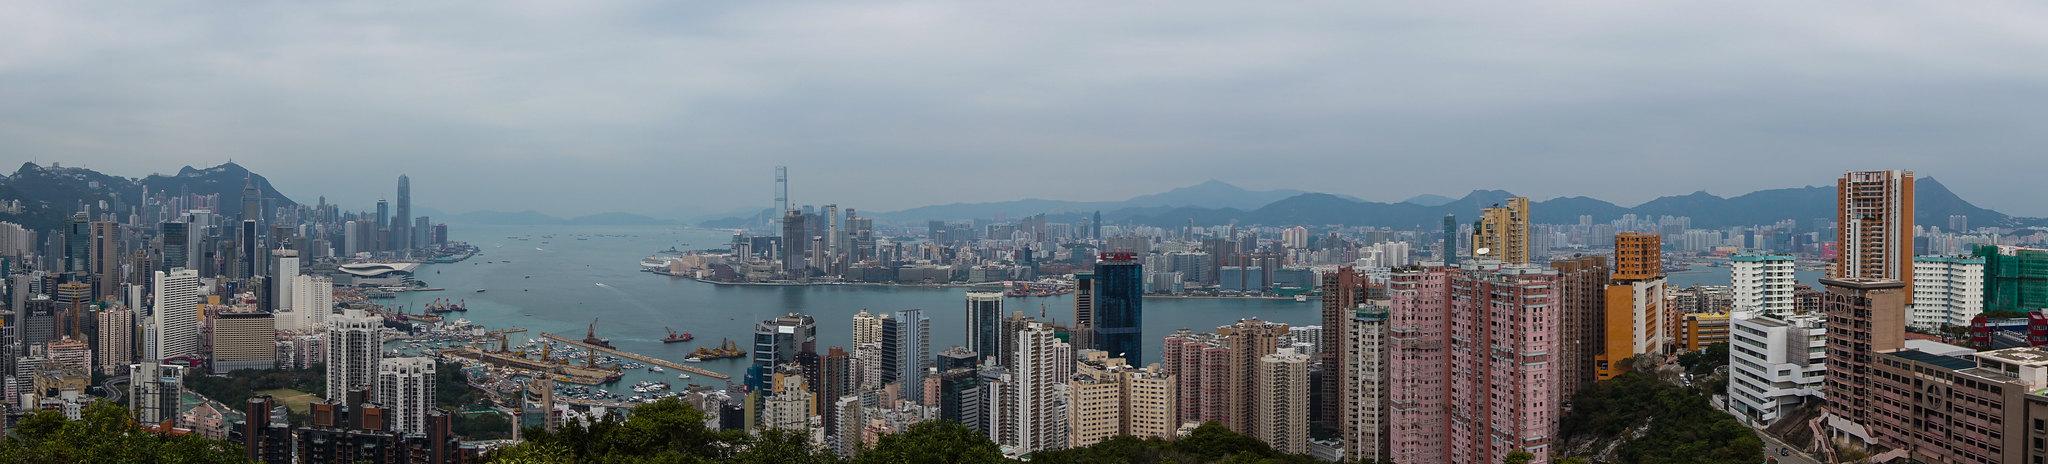 Hong Kong viajar preparativos - Panorámica de Hong Kong